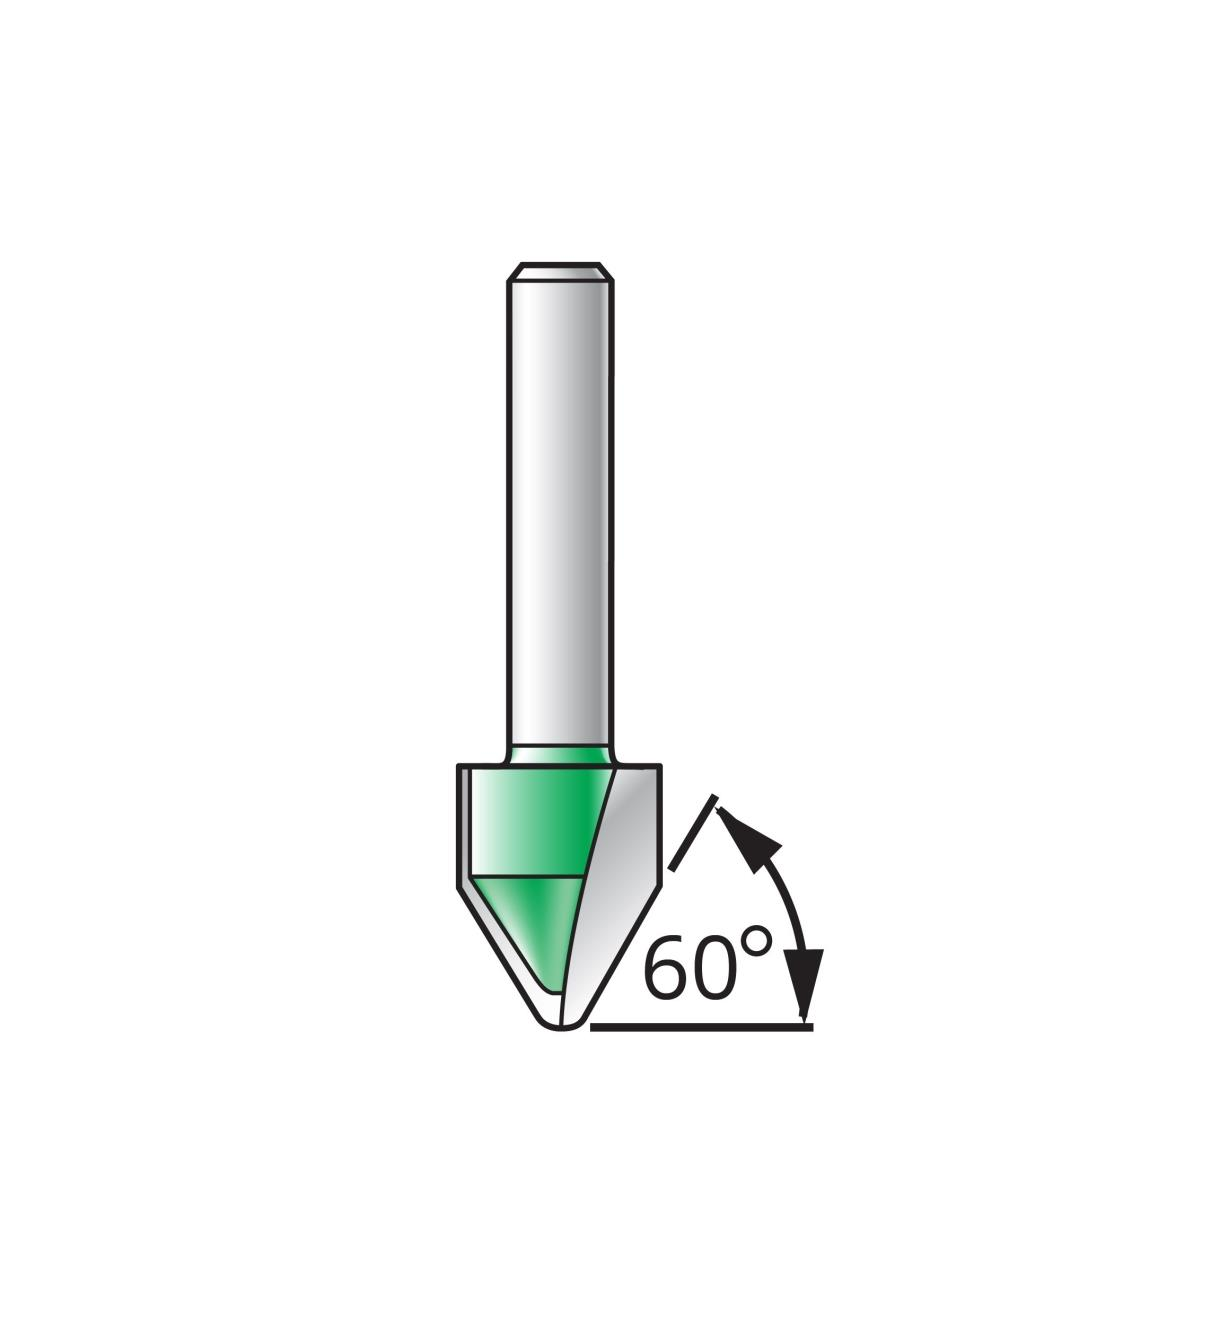 16J5201 - Mèche à lettrage à fond arrondi